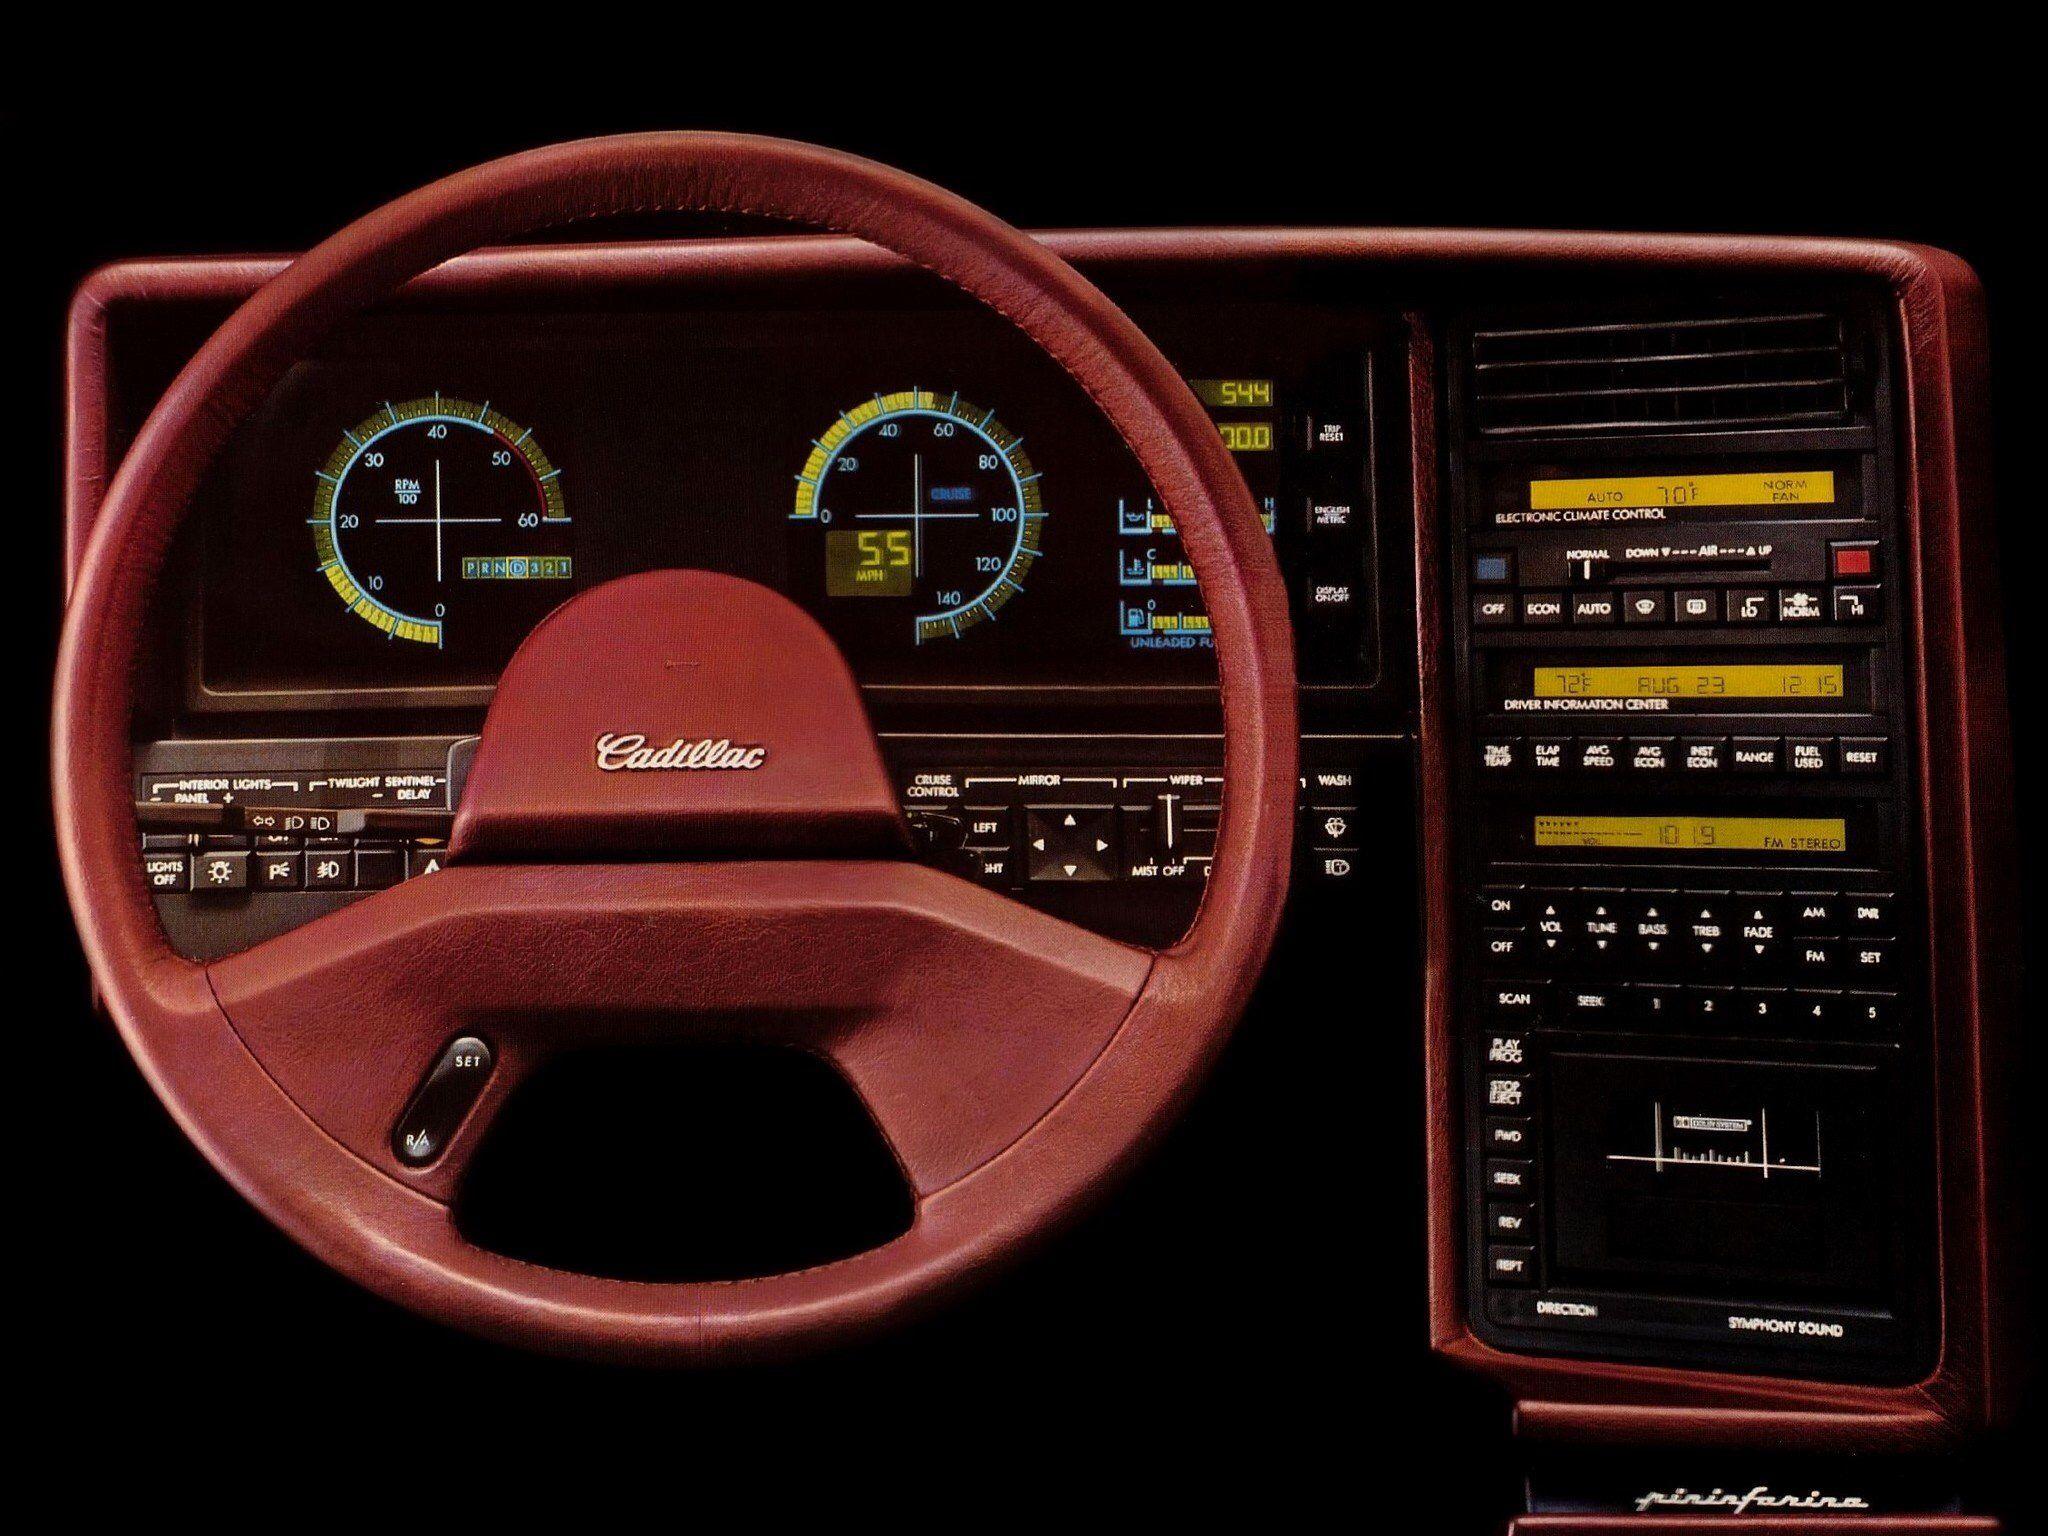 1988 Cadillac Allante by Pininfarina dash | MOODBOARD